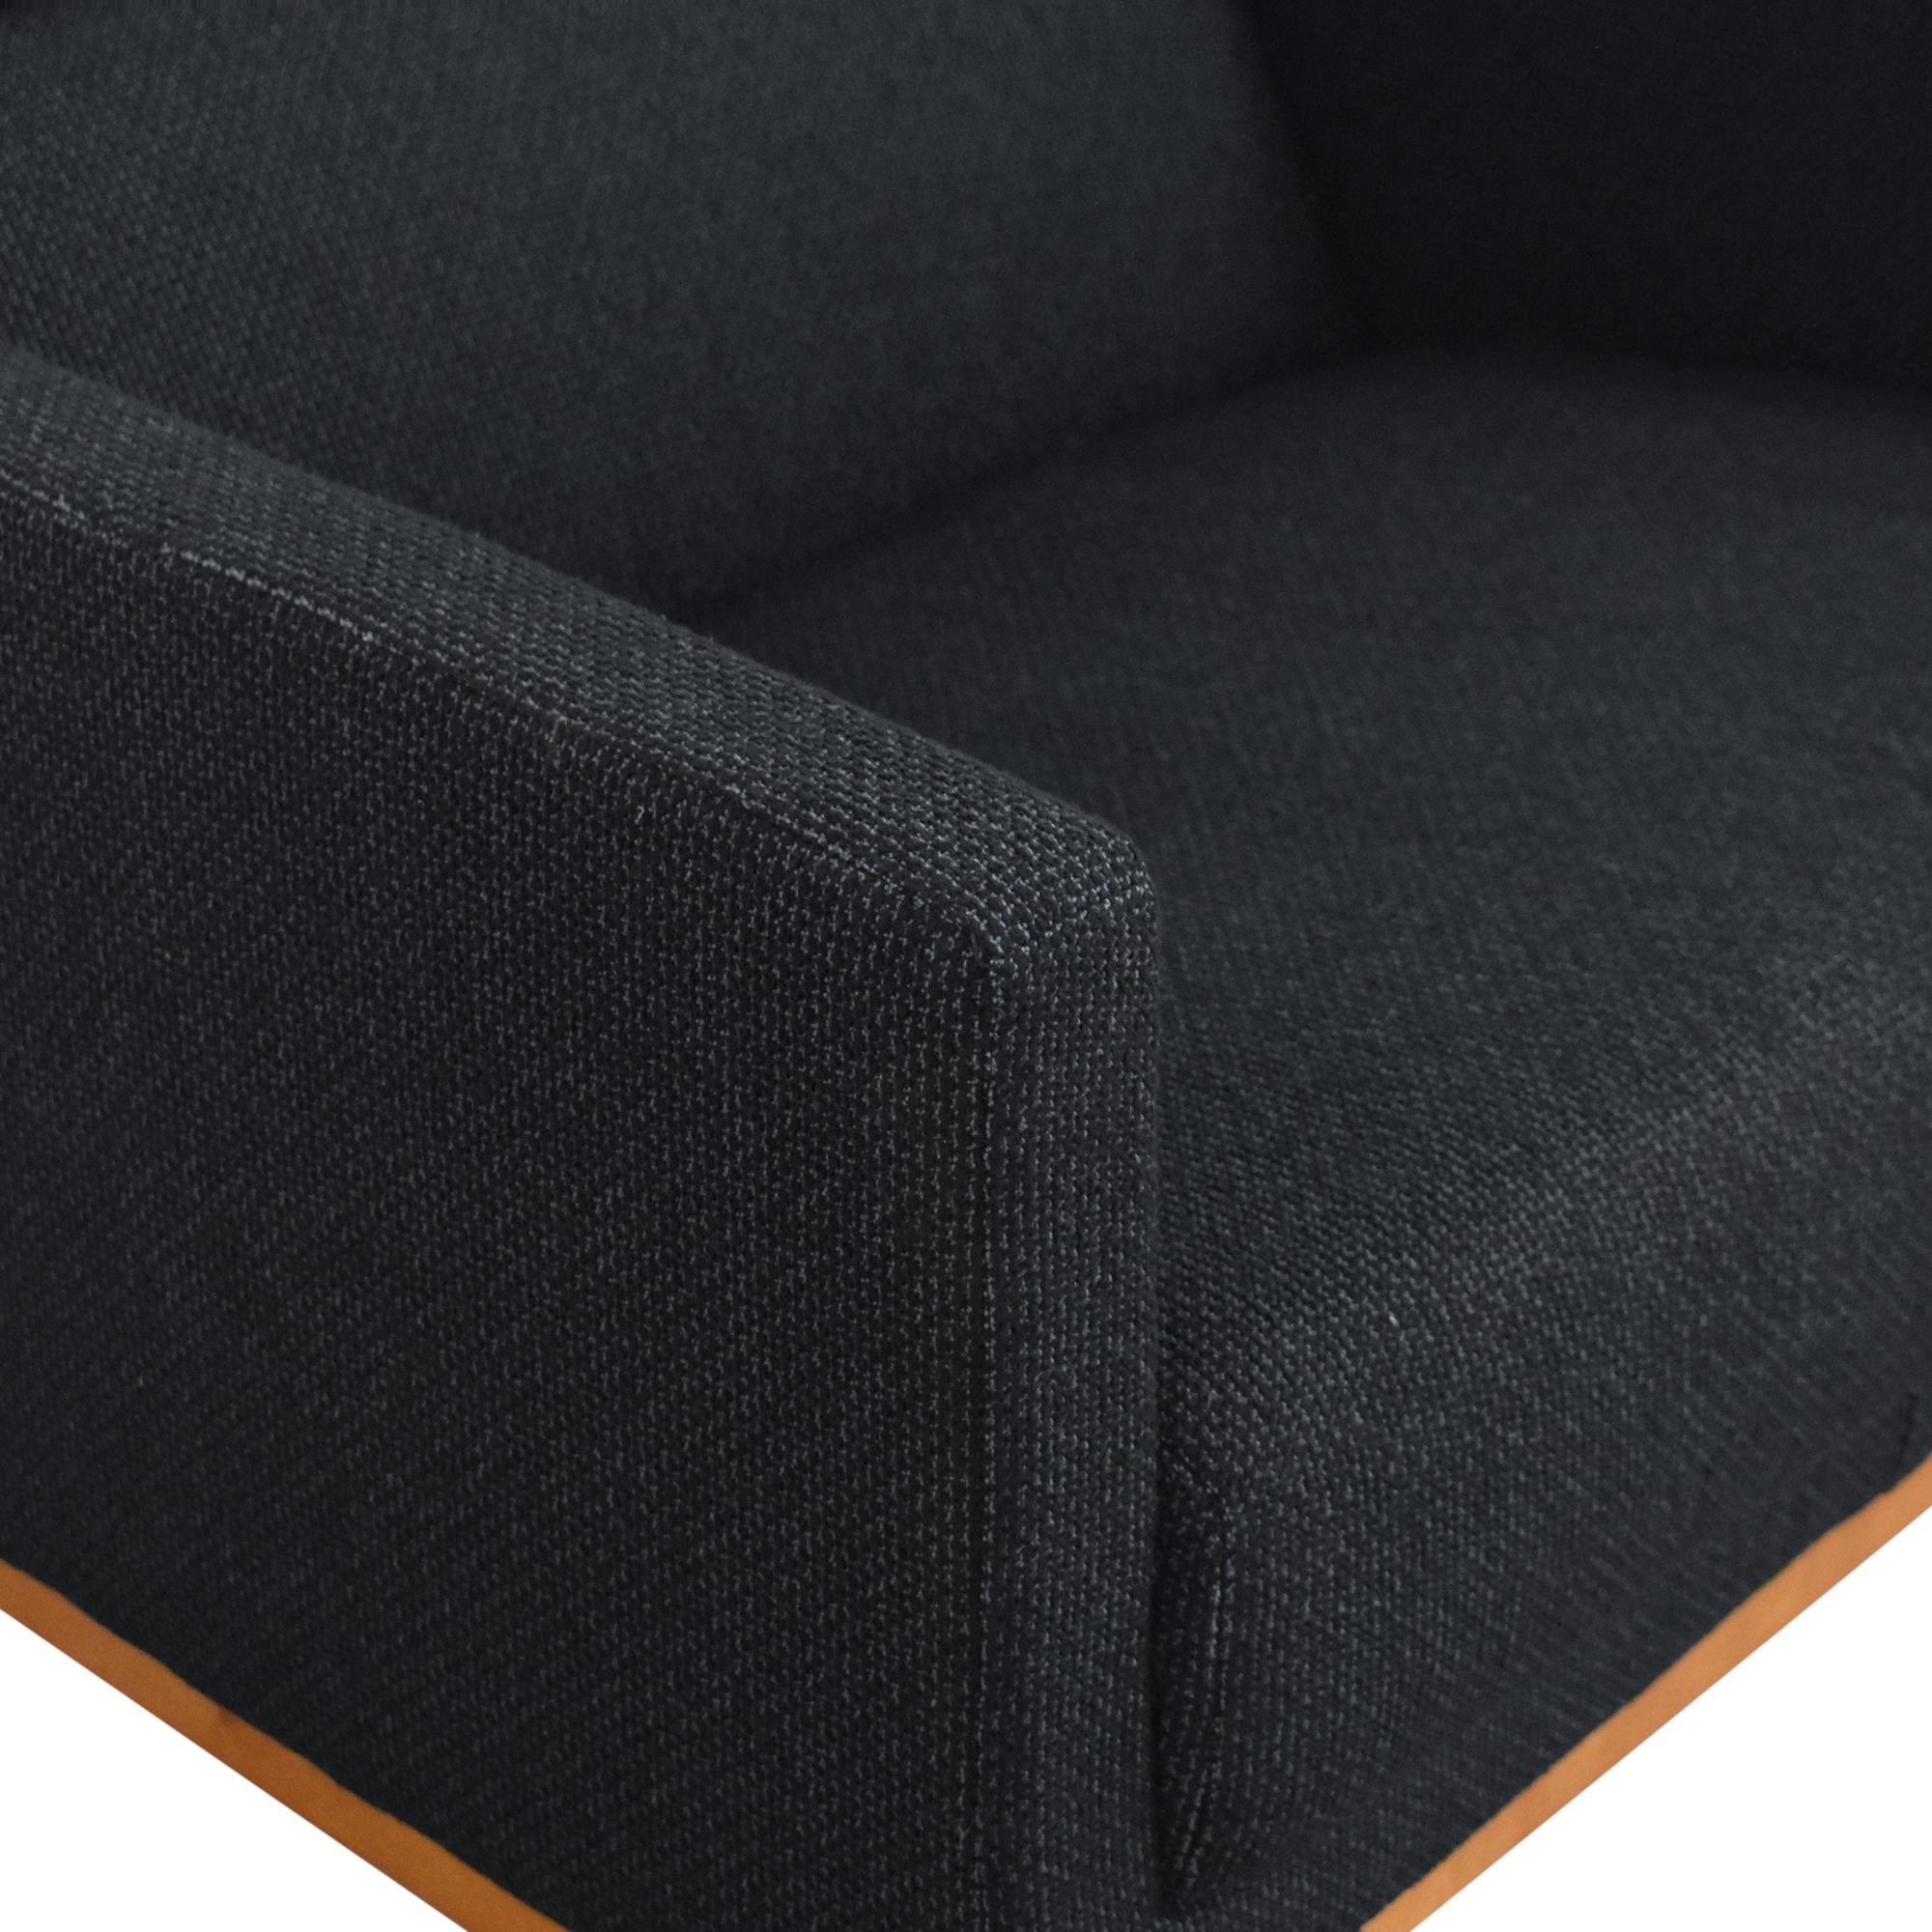 Brayton International Brayton International Passerelle Lounge Chair coupon